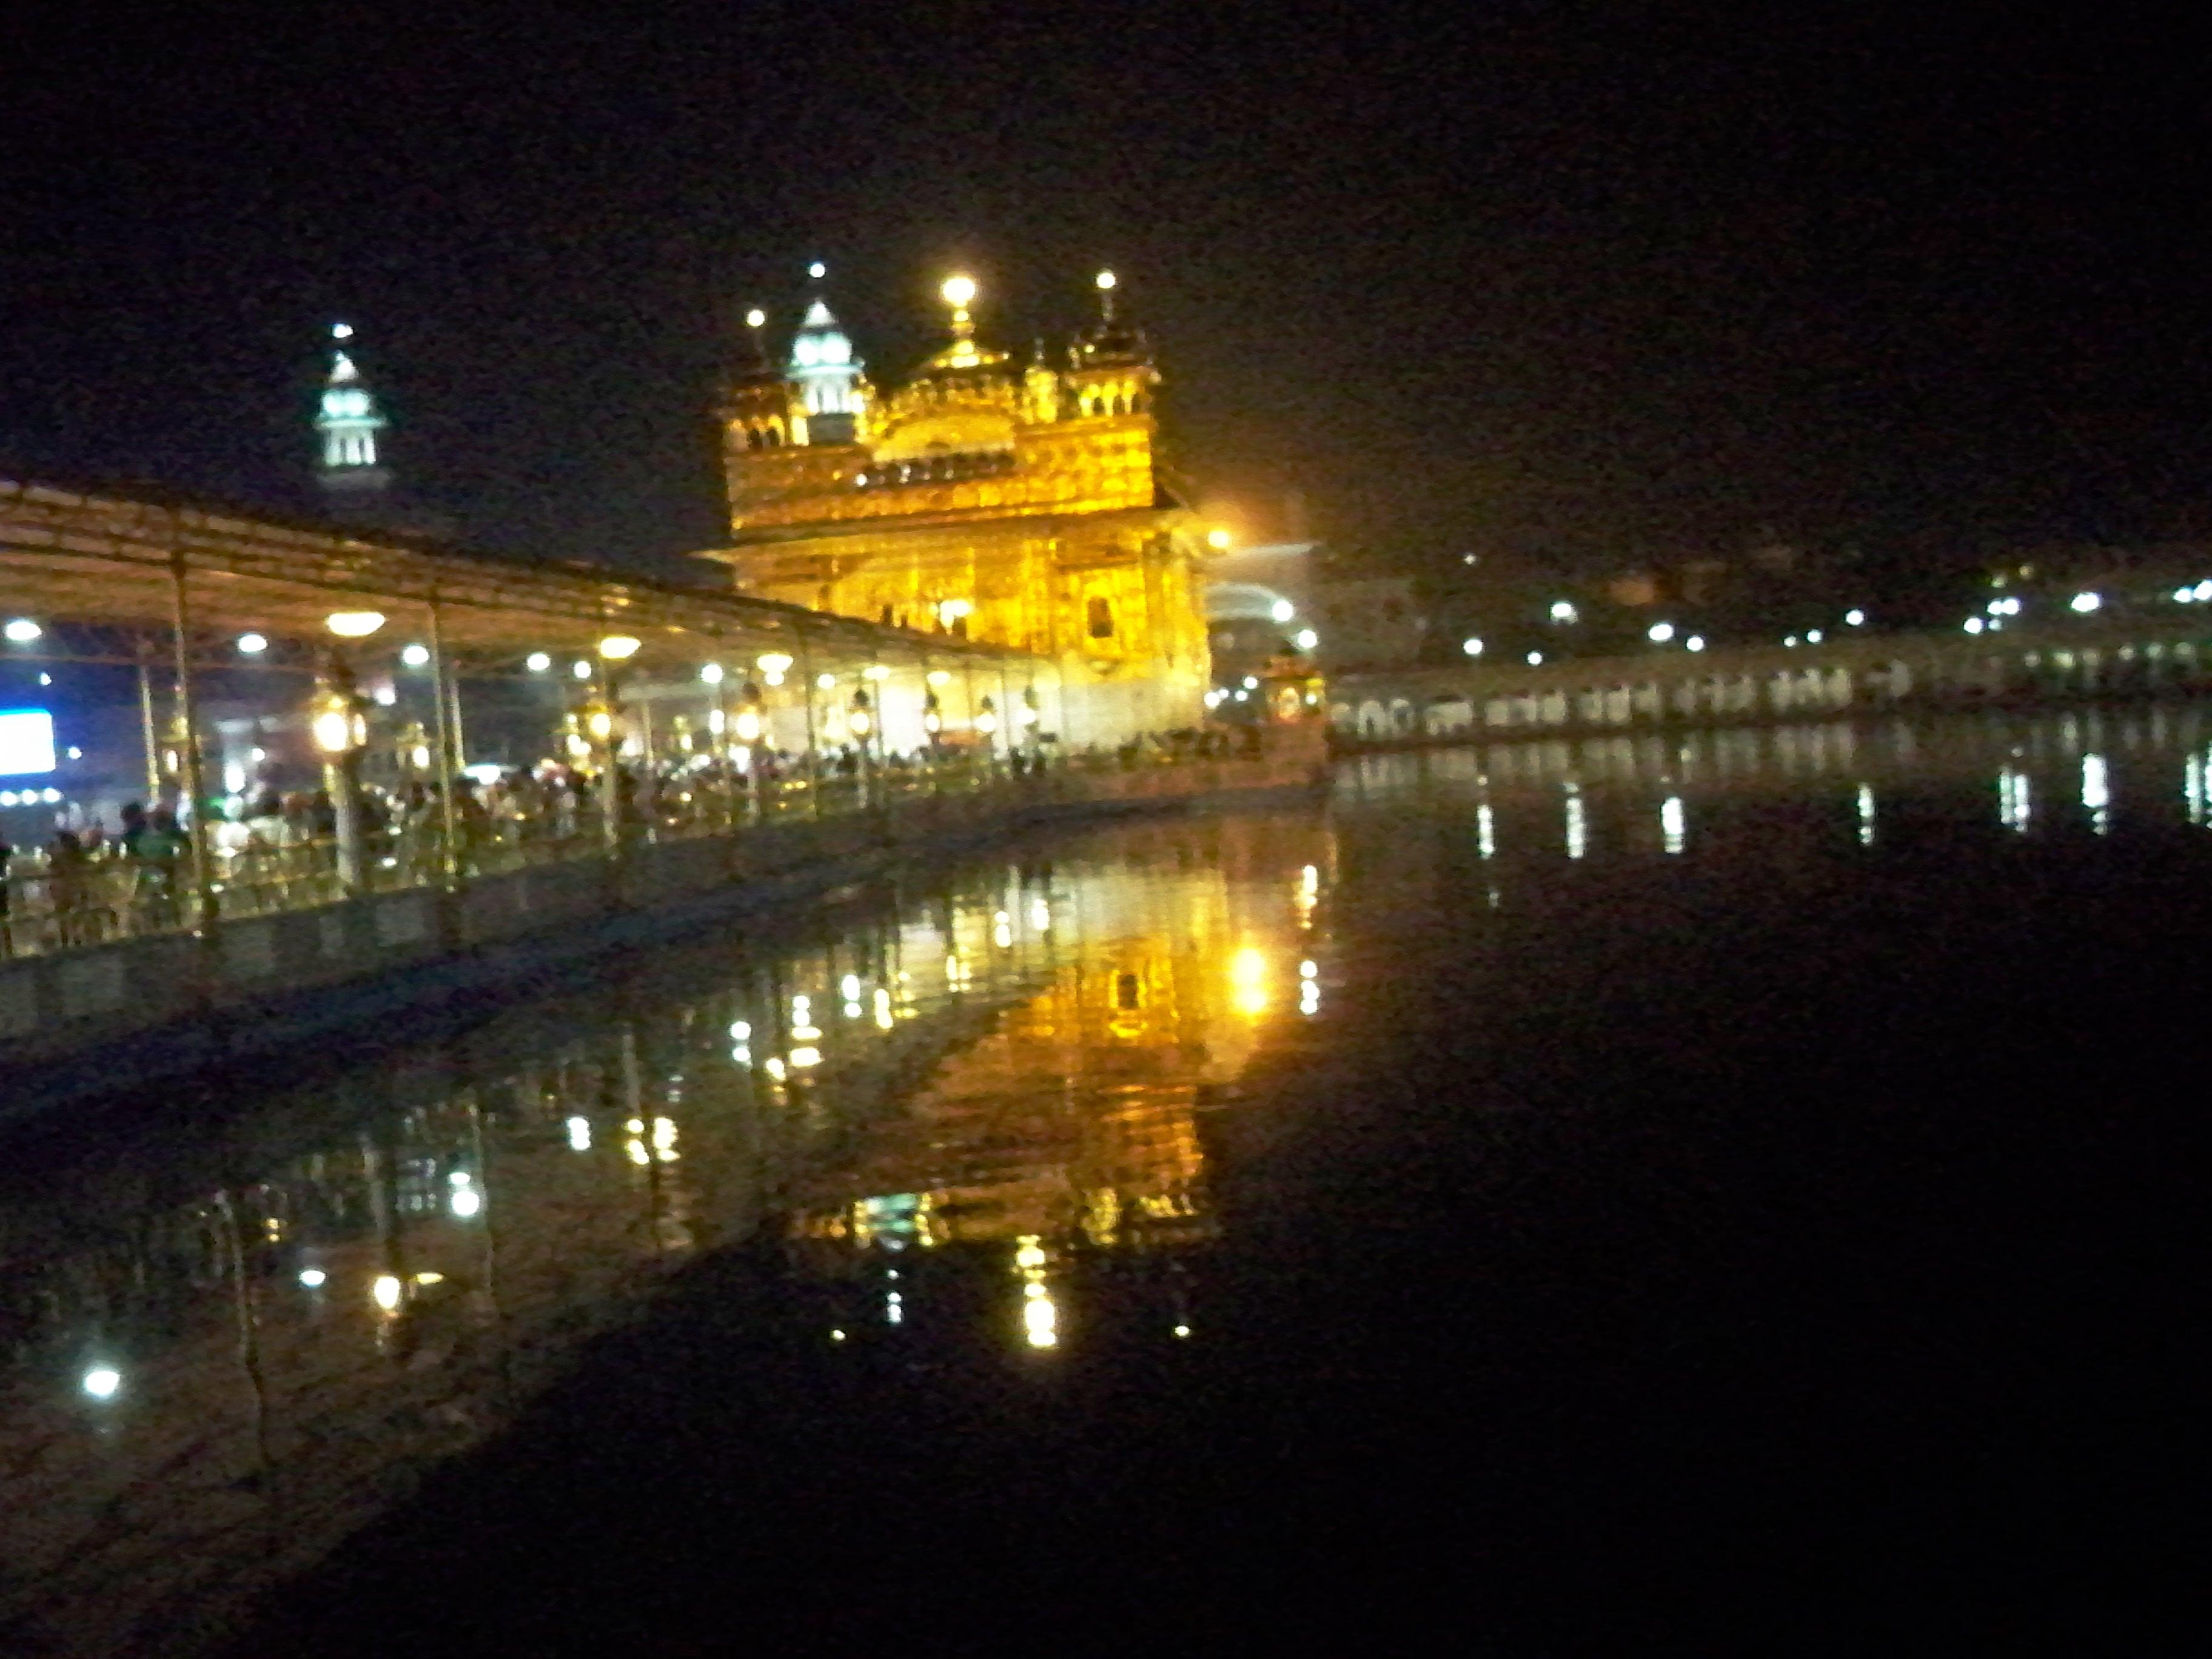 the golden temple….part 2 the langar | talesalongtheway